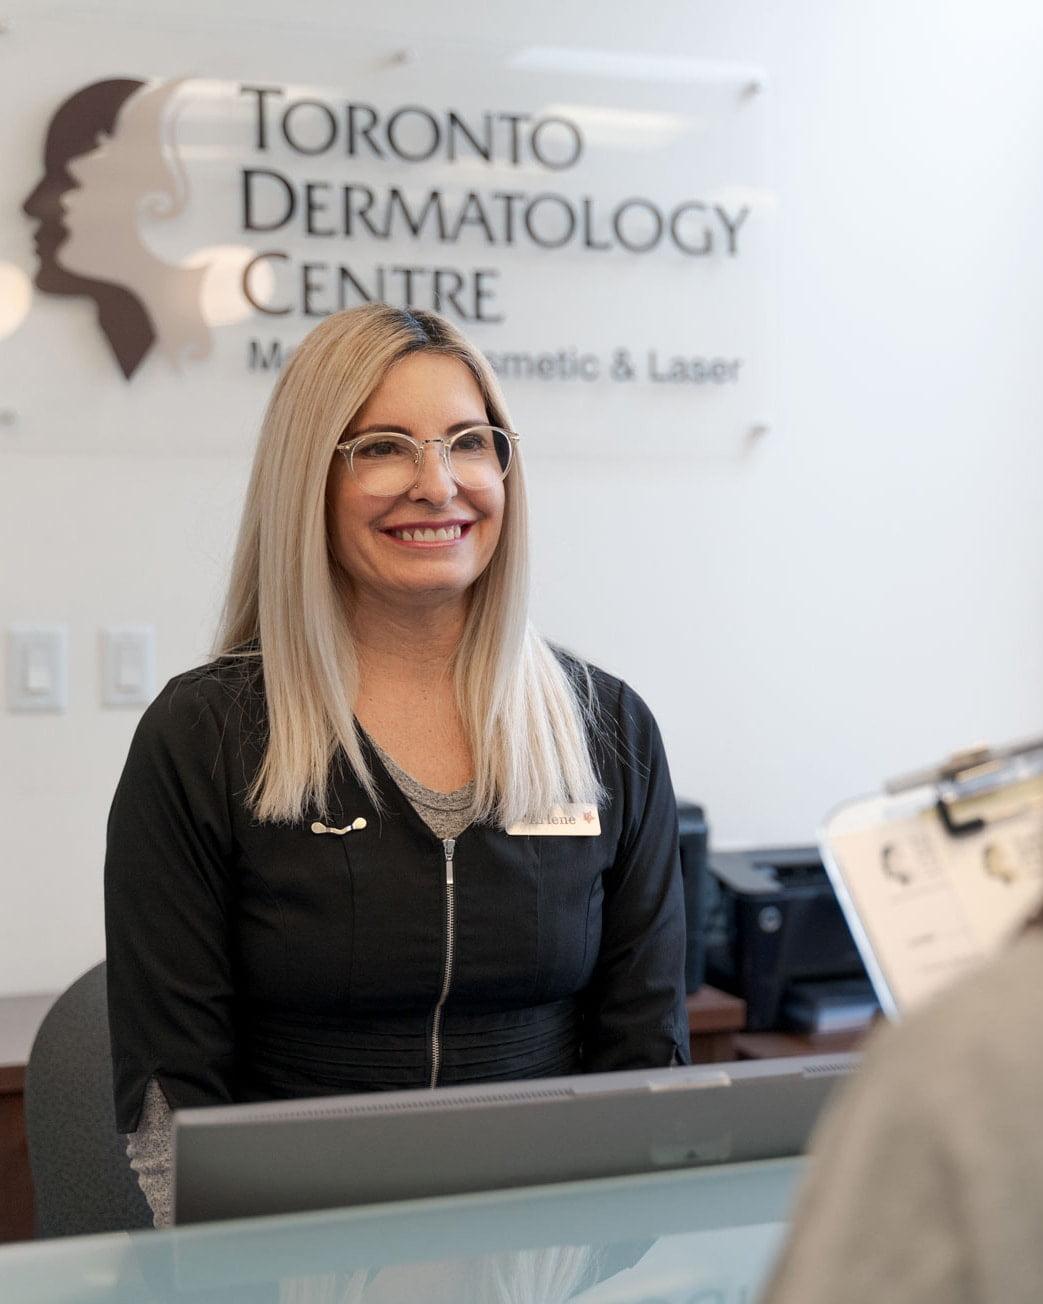 Cosmetic Clinic Photography - Carolene Studio